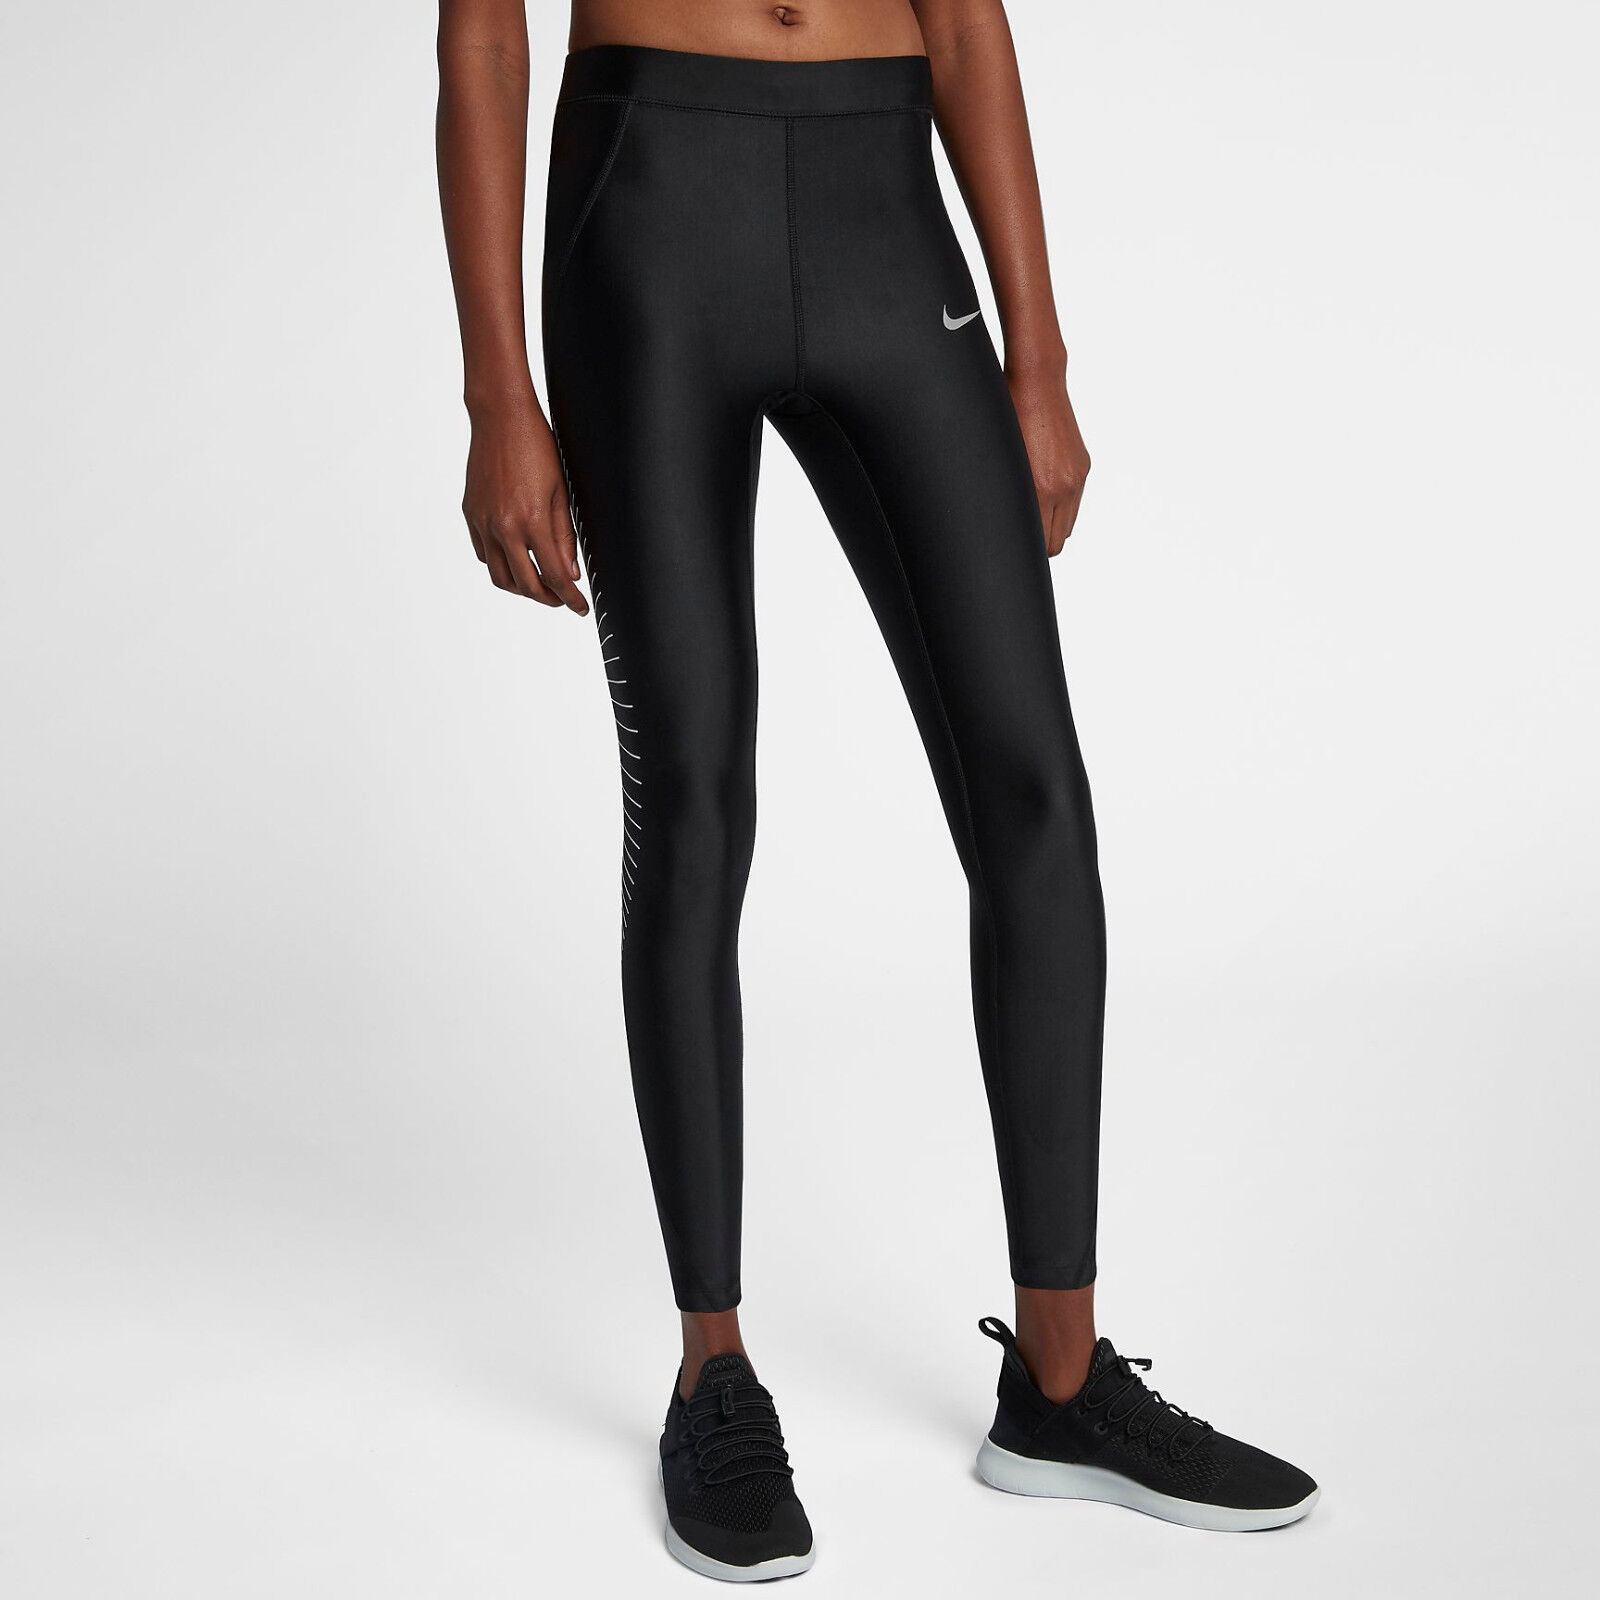 Nike Speed Dri-Fit TRAINING CORSA PALESTRA donna Collant FIT FIT FIT XS f329d1